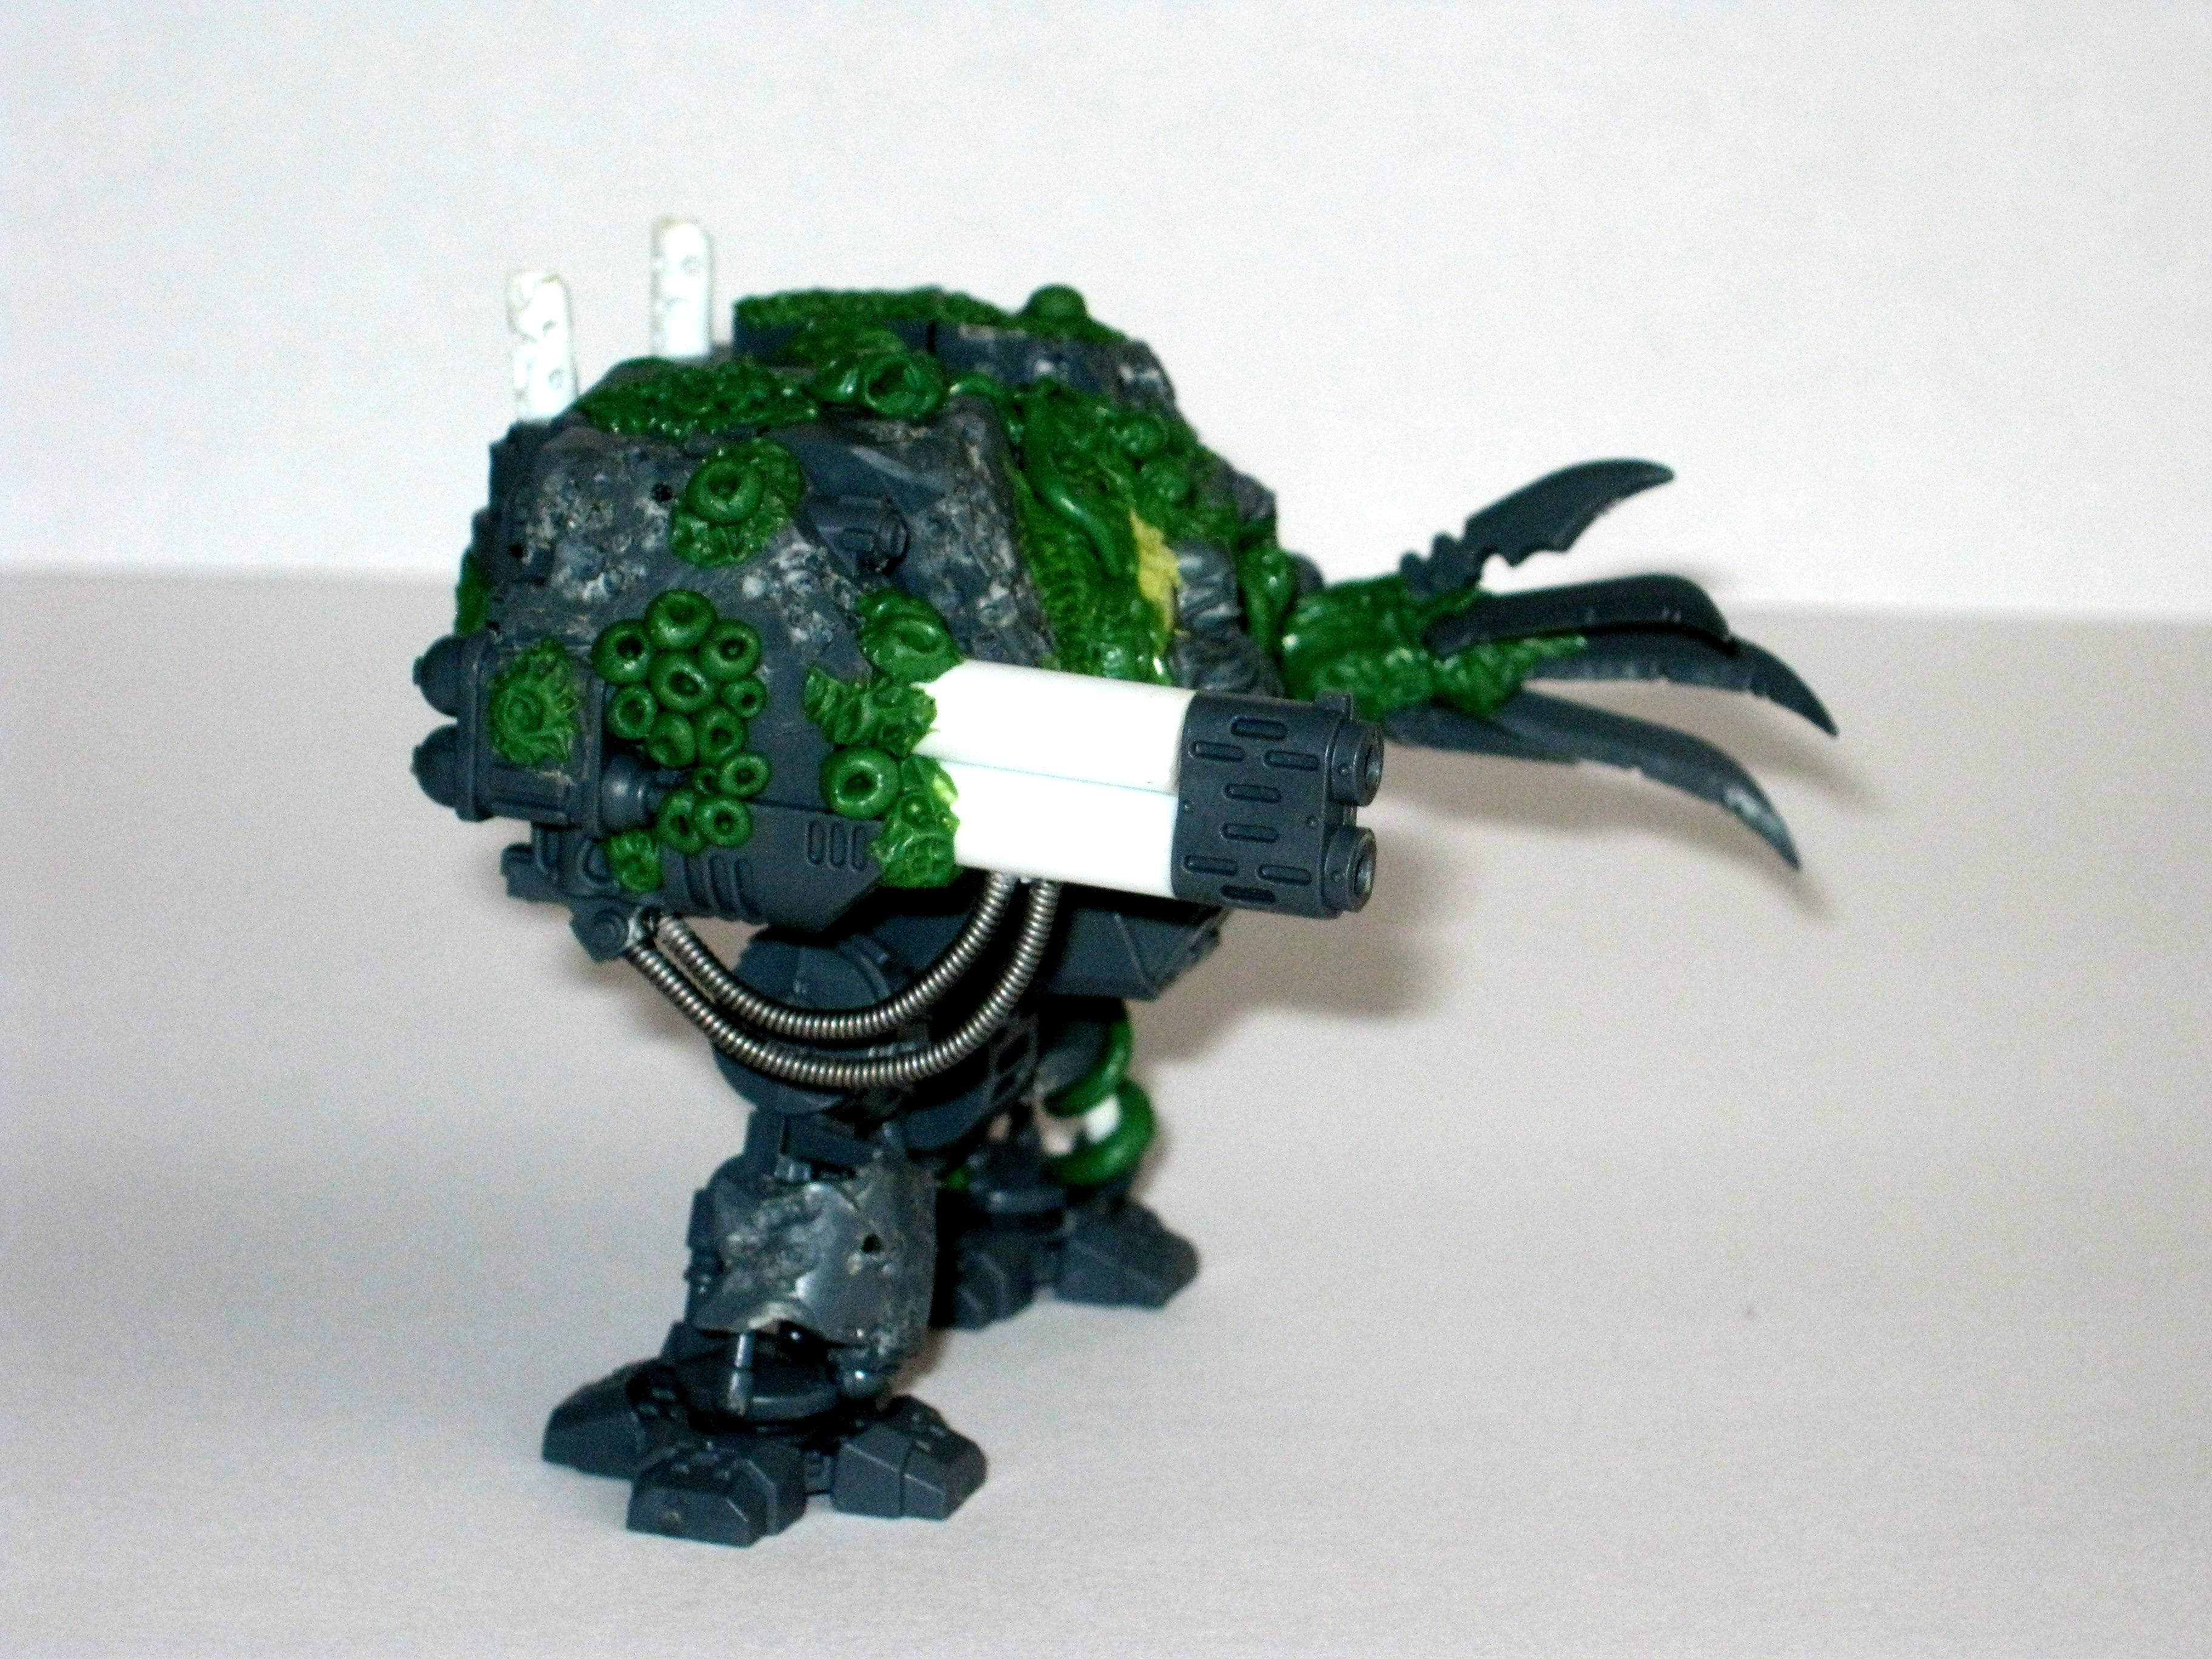 Chaos, Dreadnought, Nurgle